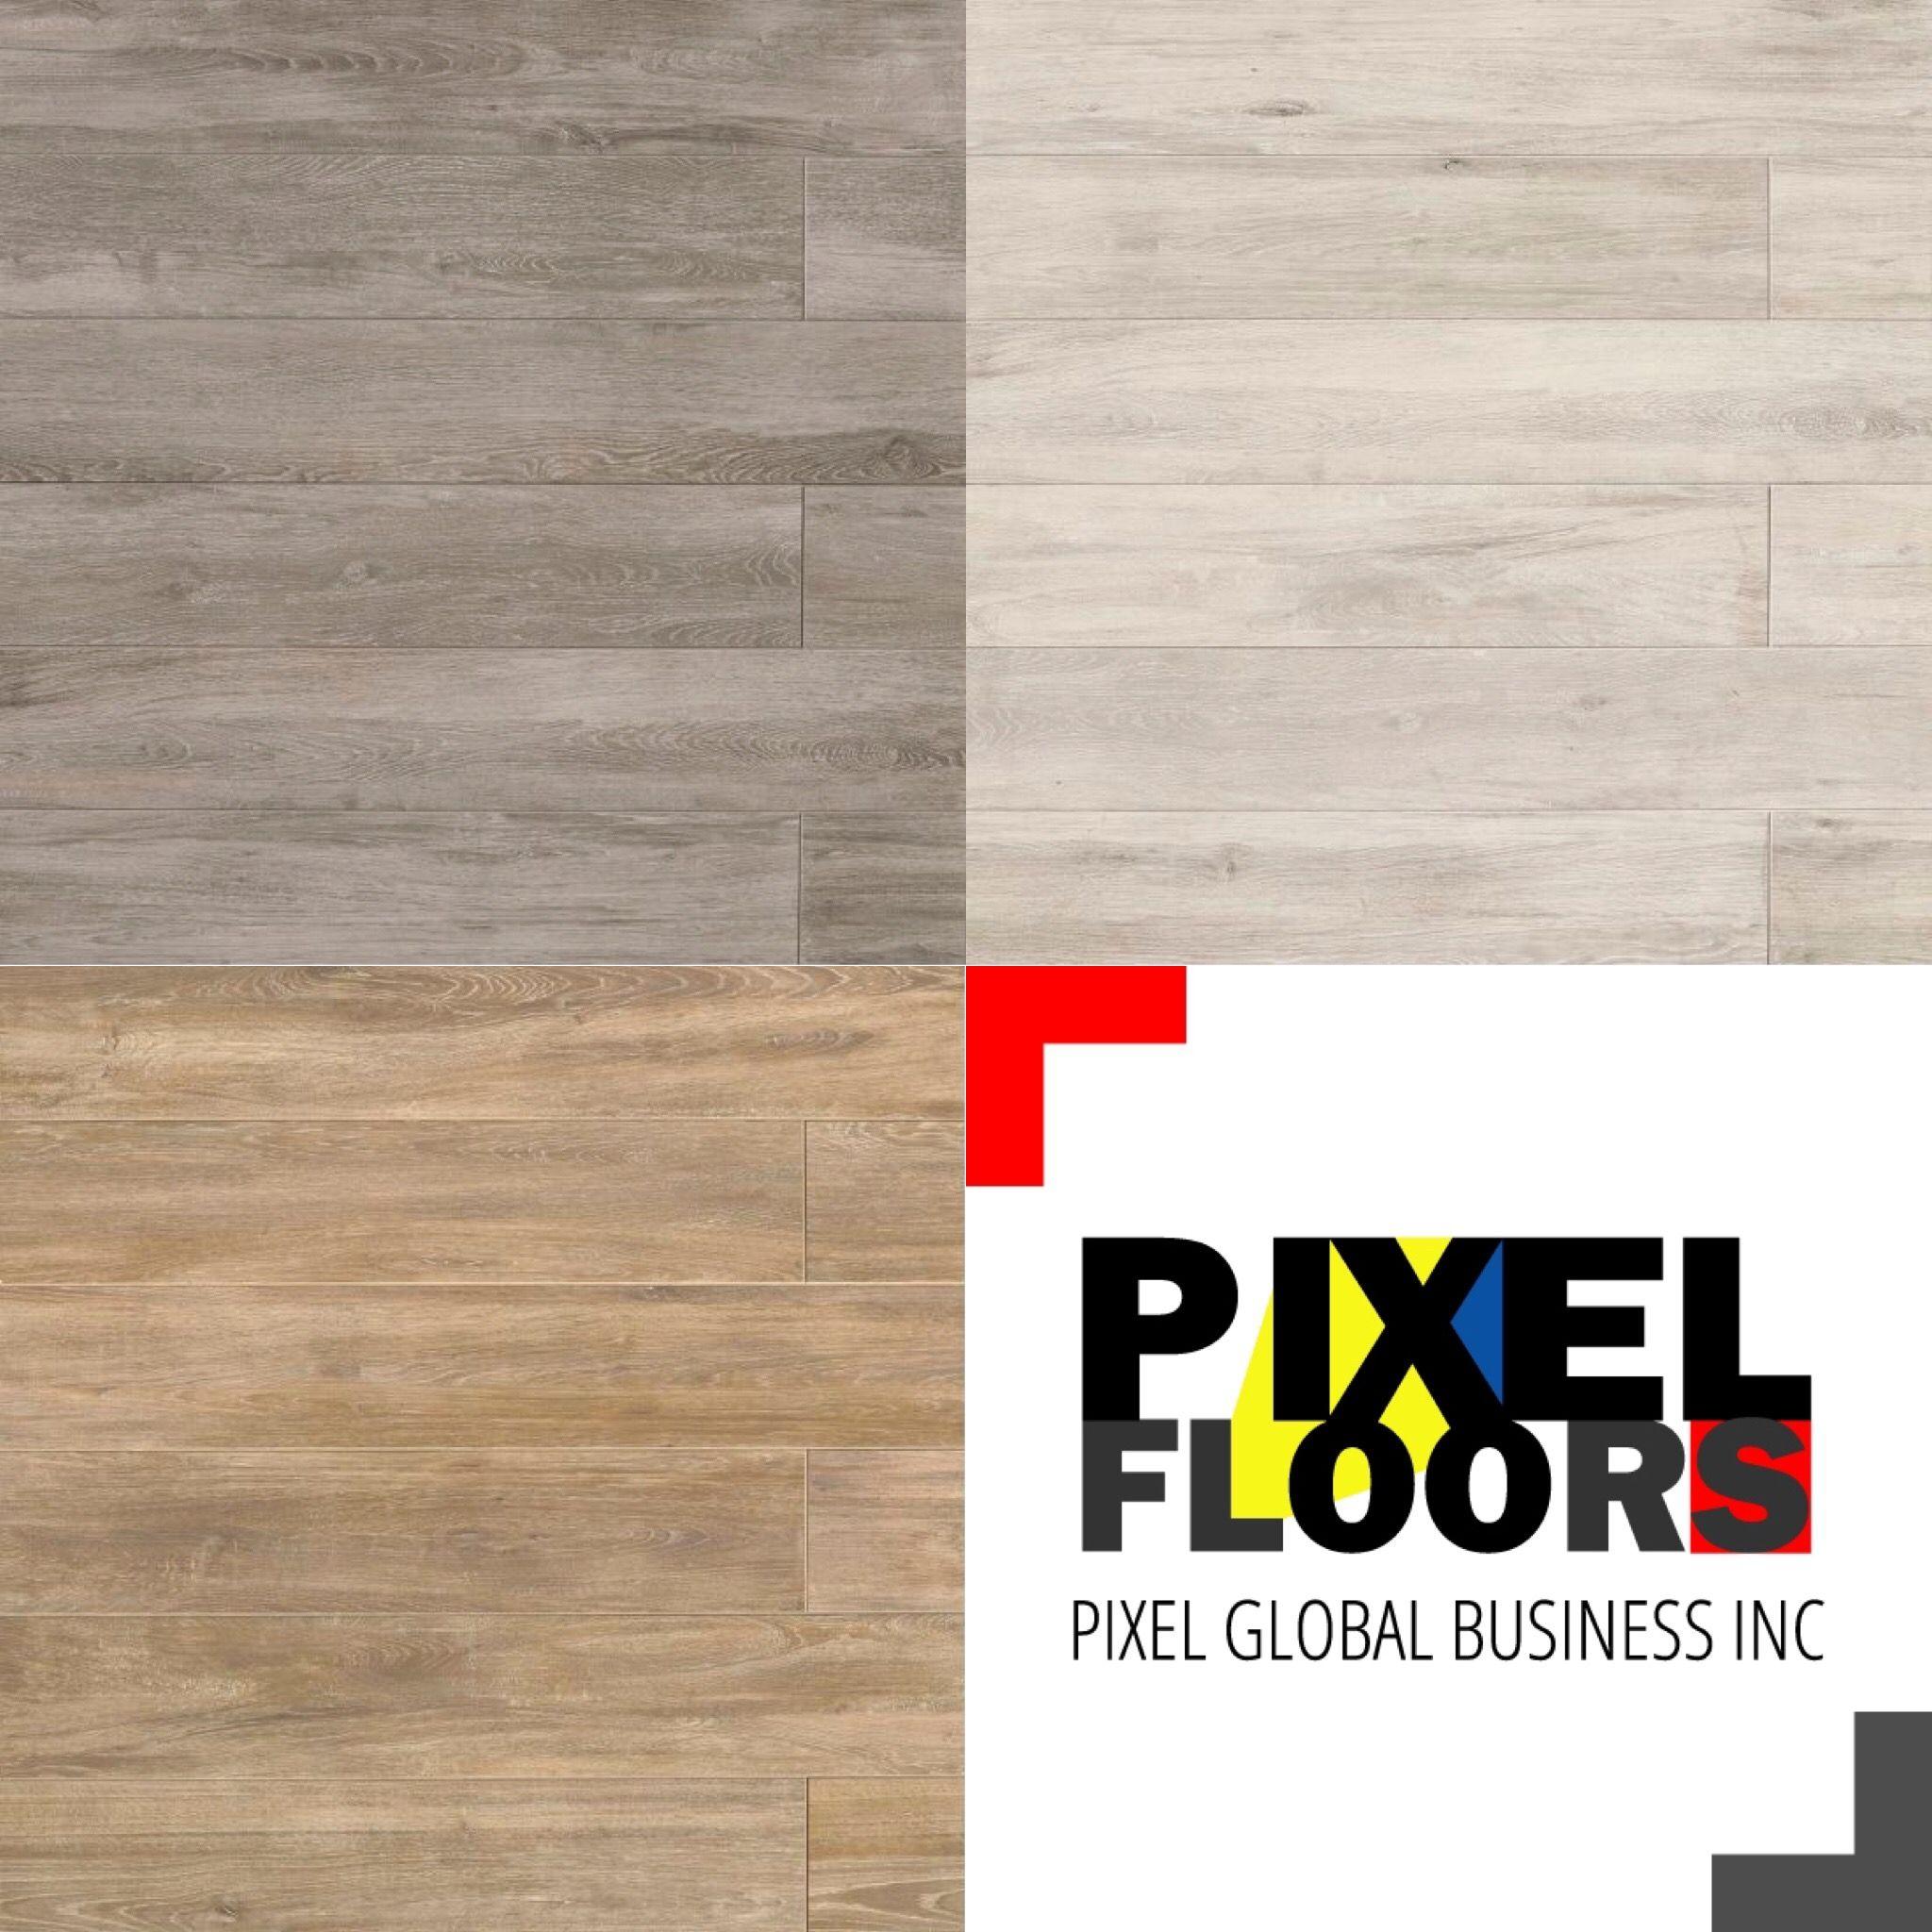 Othello Tile Collection: Othello Disponible en Pixel Floors #ceramica #ceramicas #pisos #pixelfloors #miami #pembrokepines #doral #miramar #ofertas #moda  Visitenos, llámenos o escribanos y le cotizaremos sin compromisos!